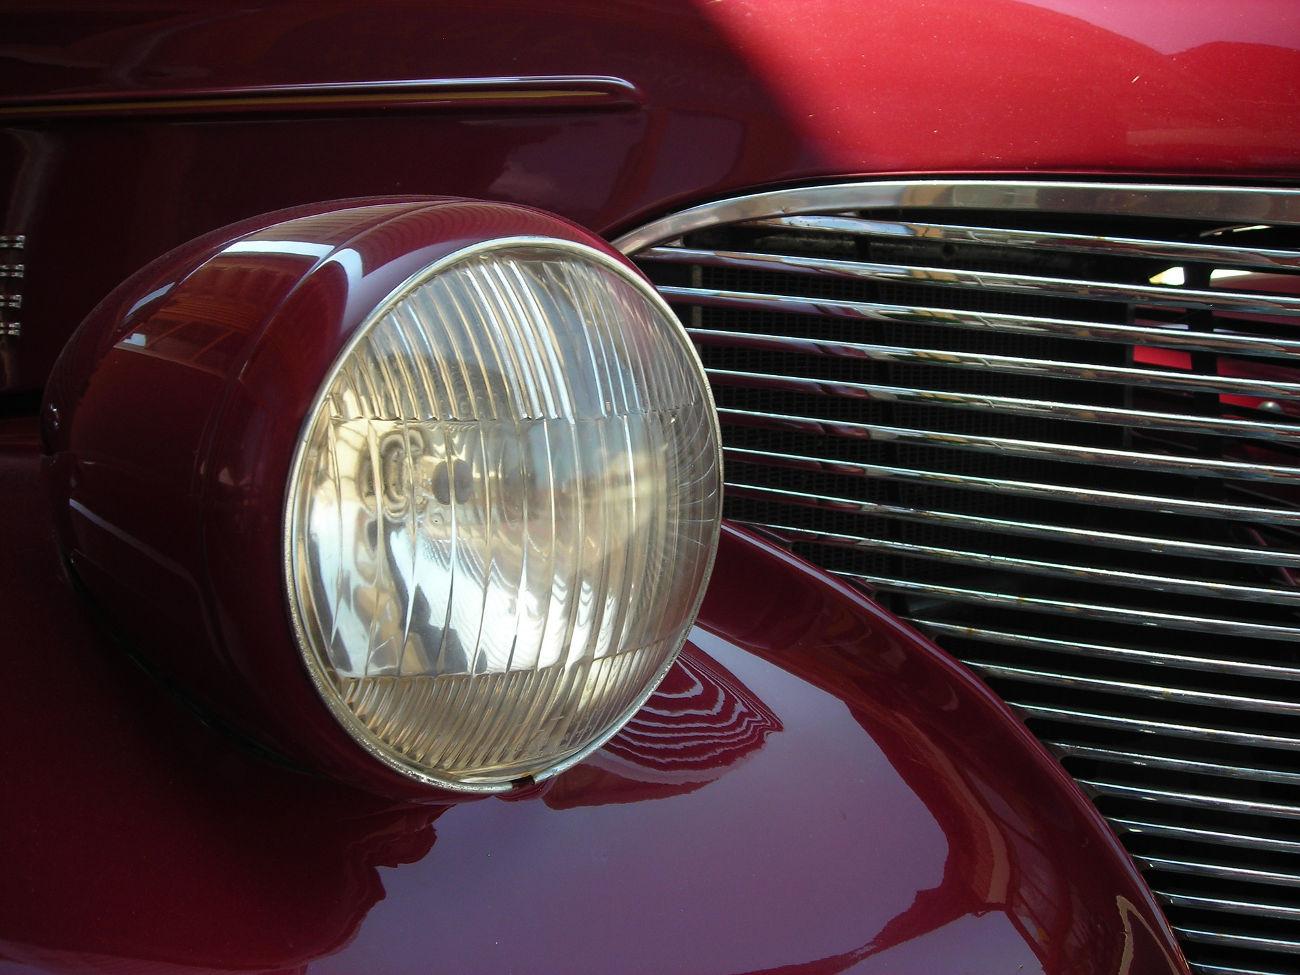 Vintage And Classic Motors Festival Mulhouse - Classic car motors